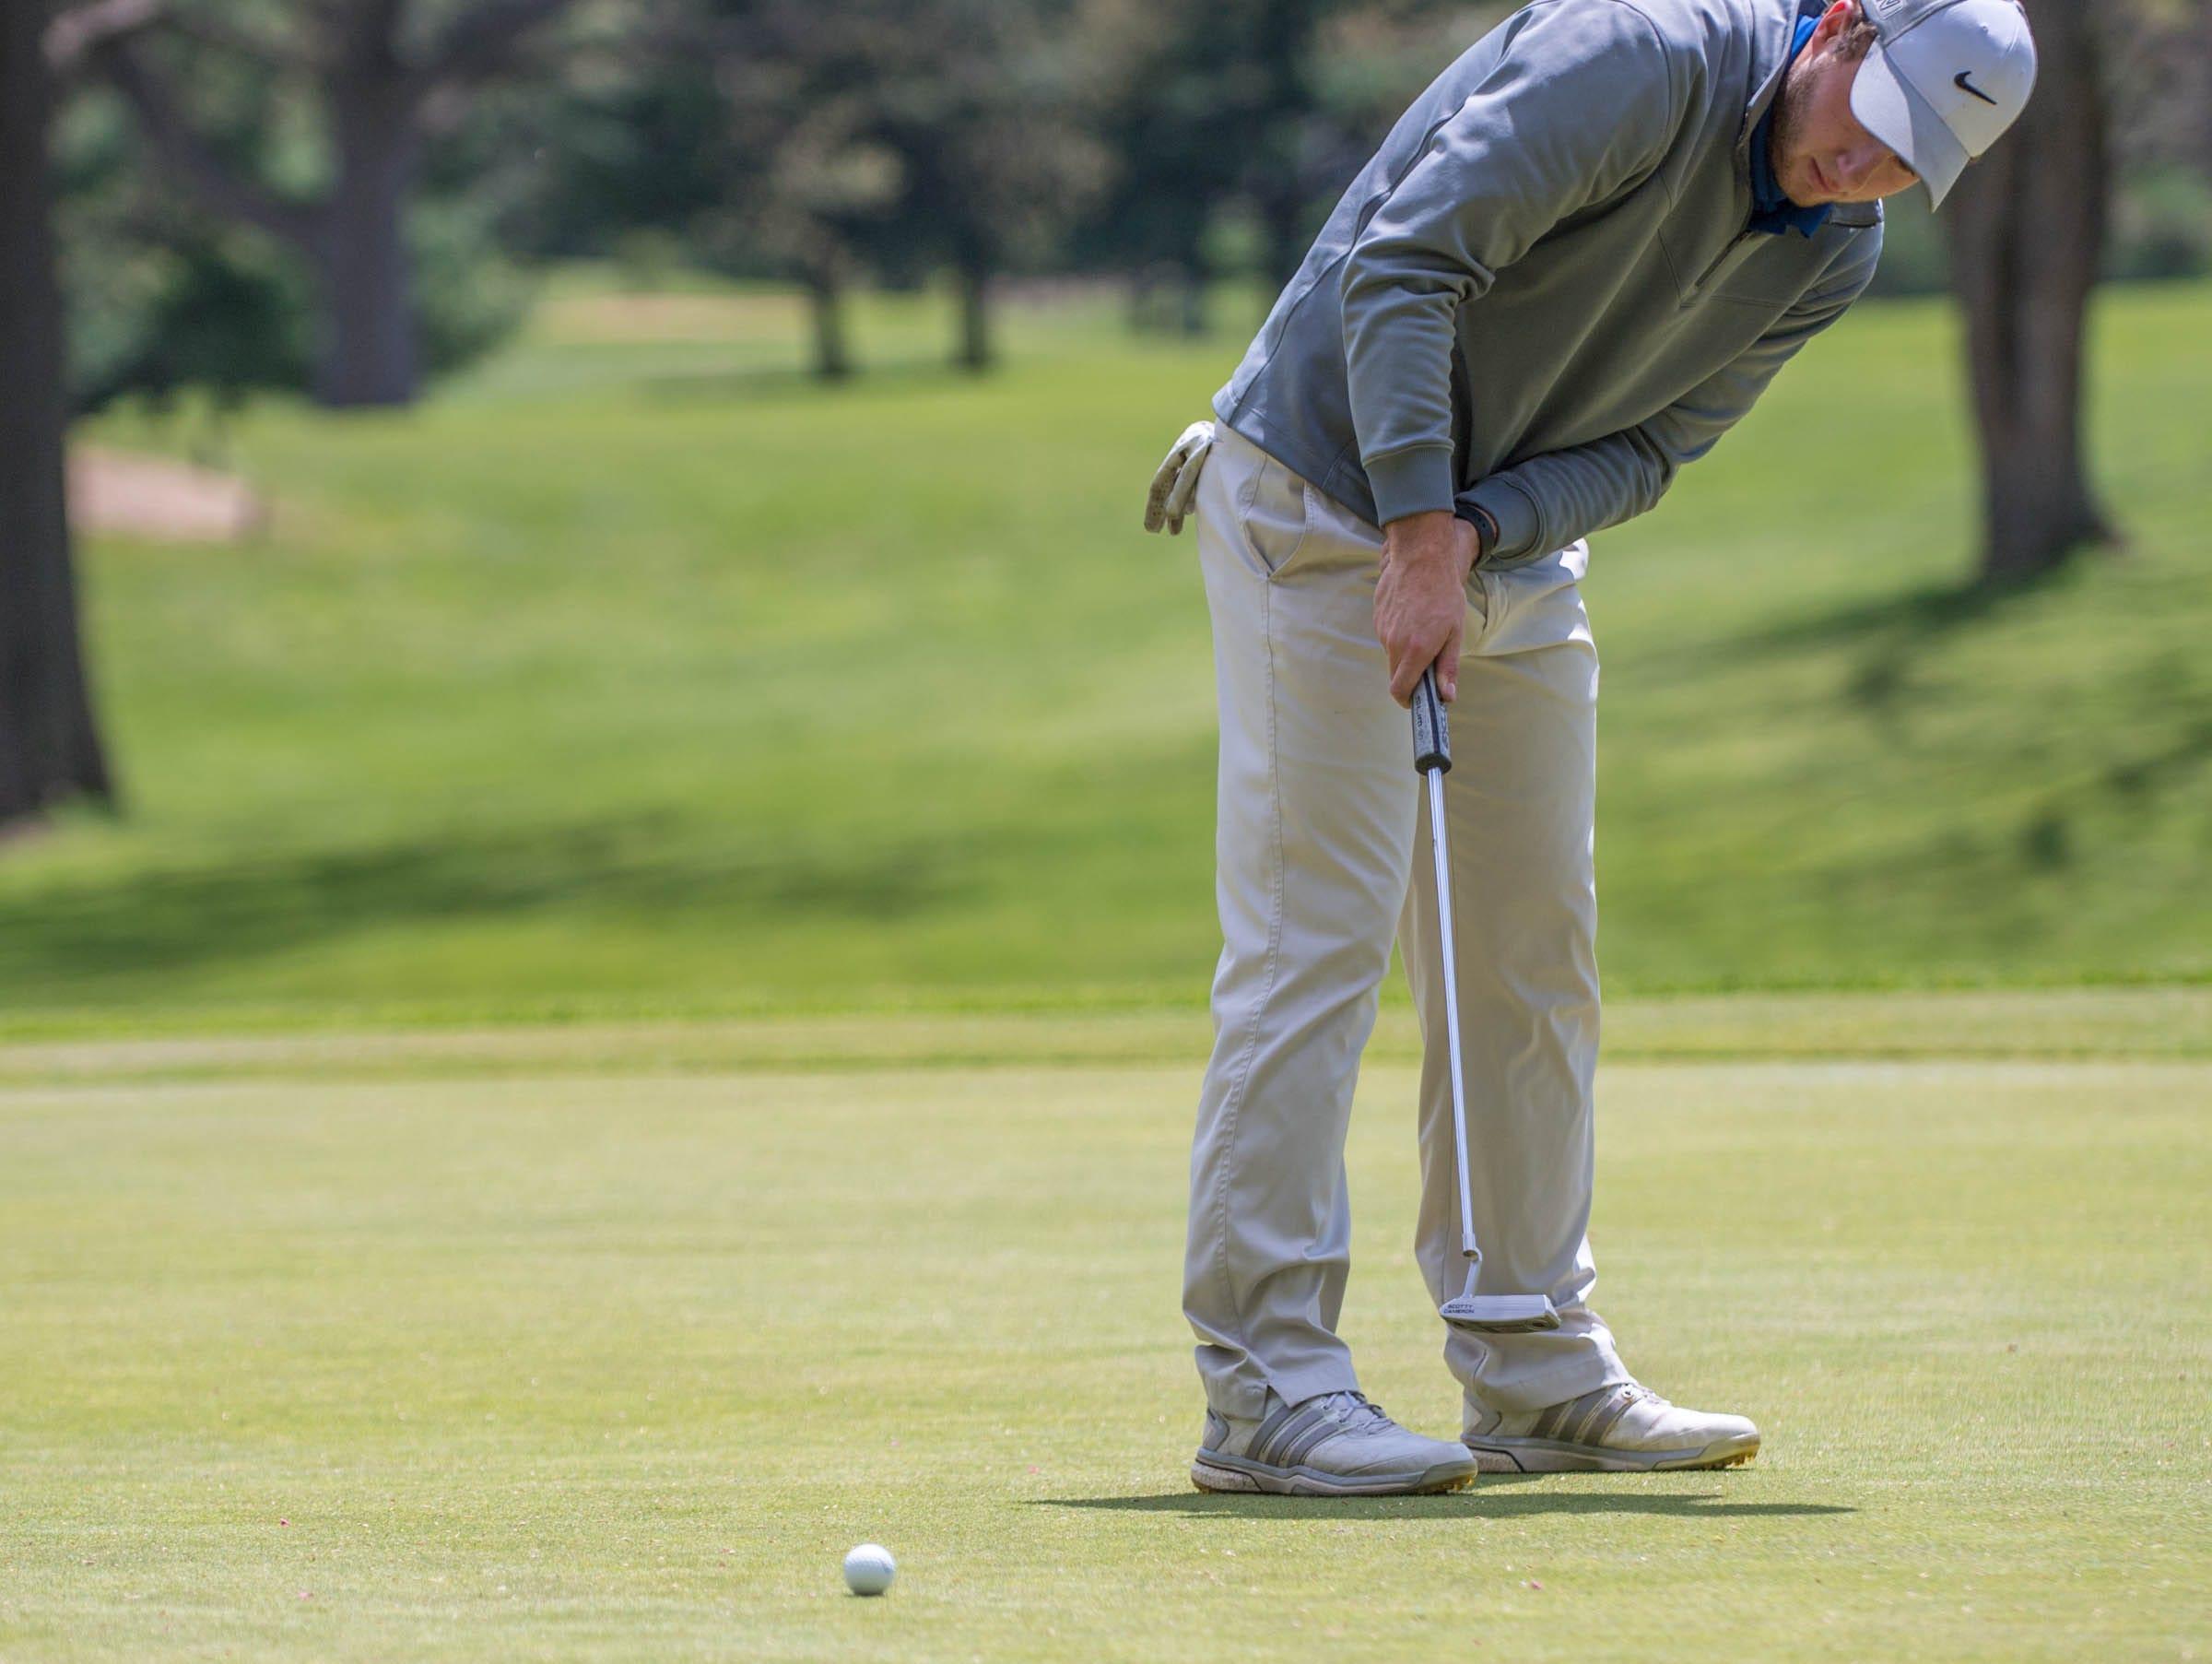 Harper Creek junior Alex Johnson hits his putt during All City High School Golf at Riverside Golf Club on Friday.